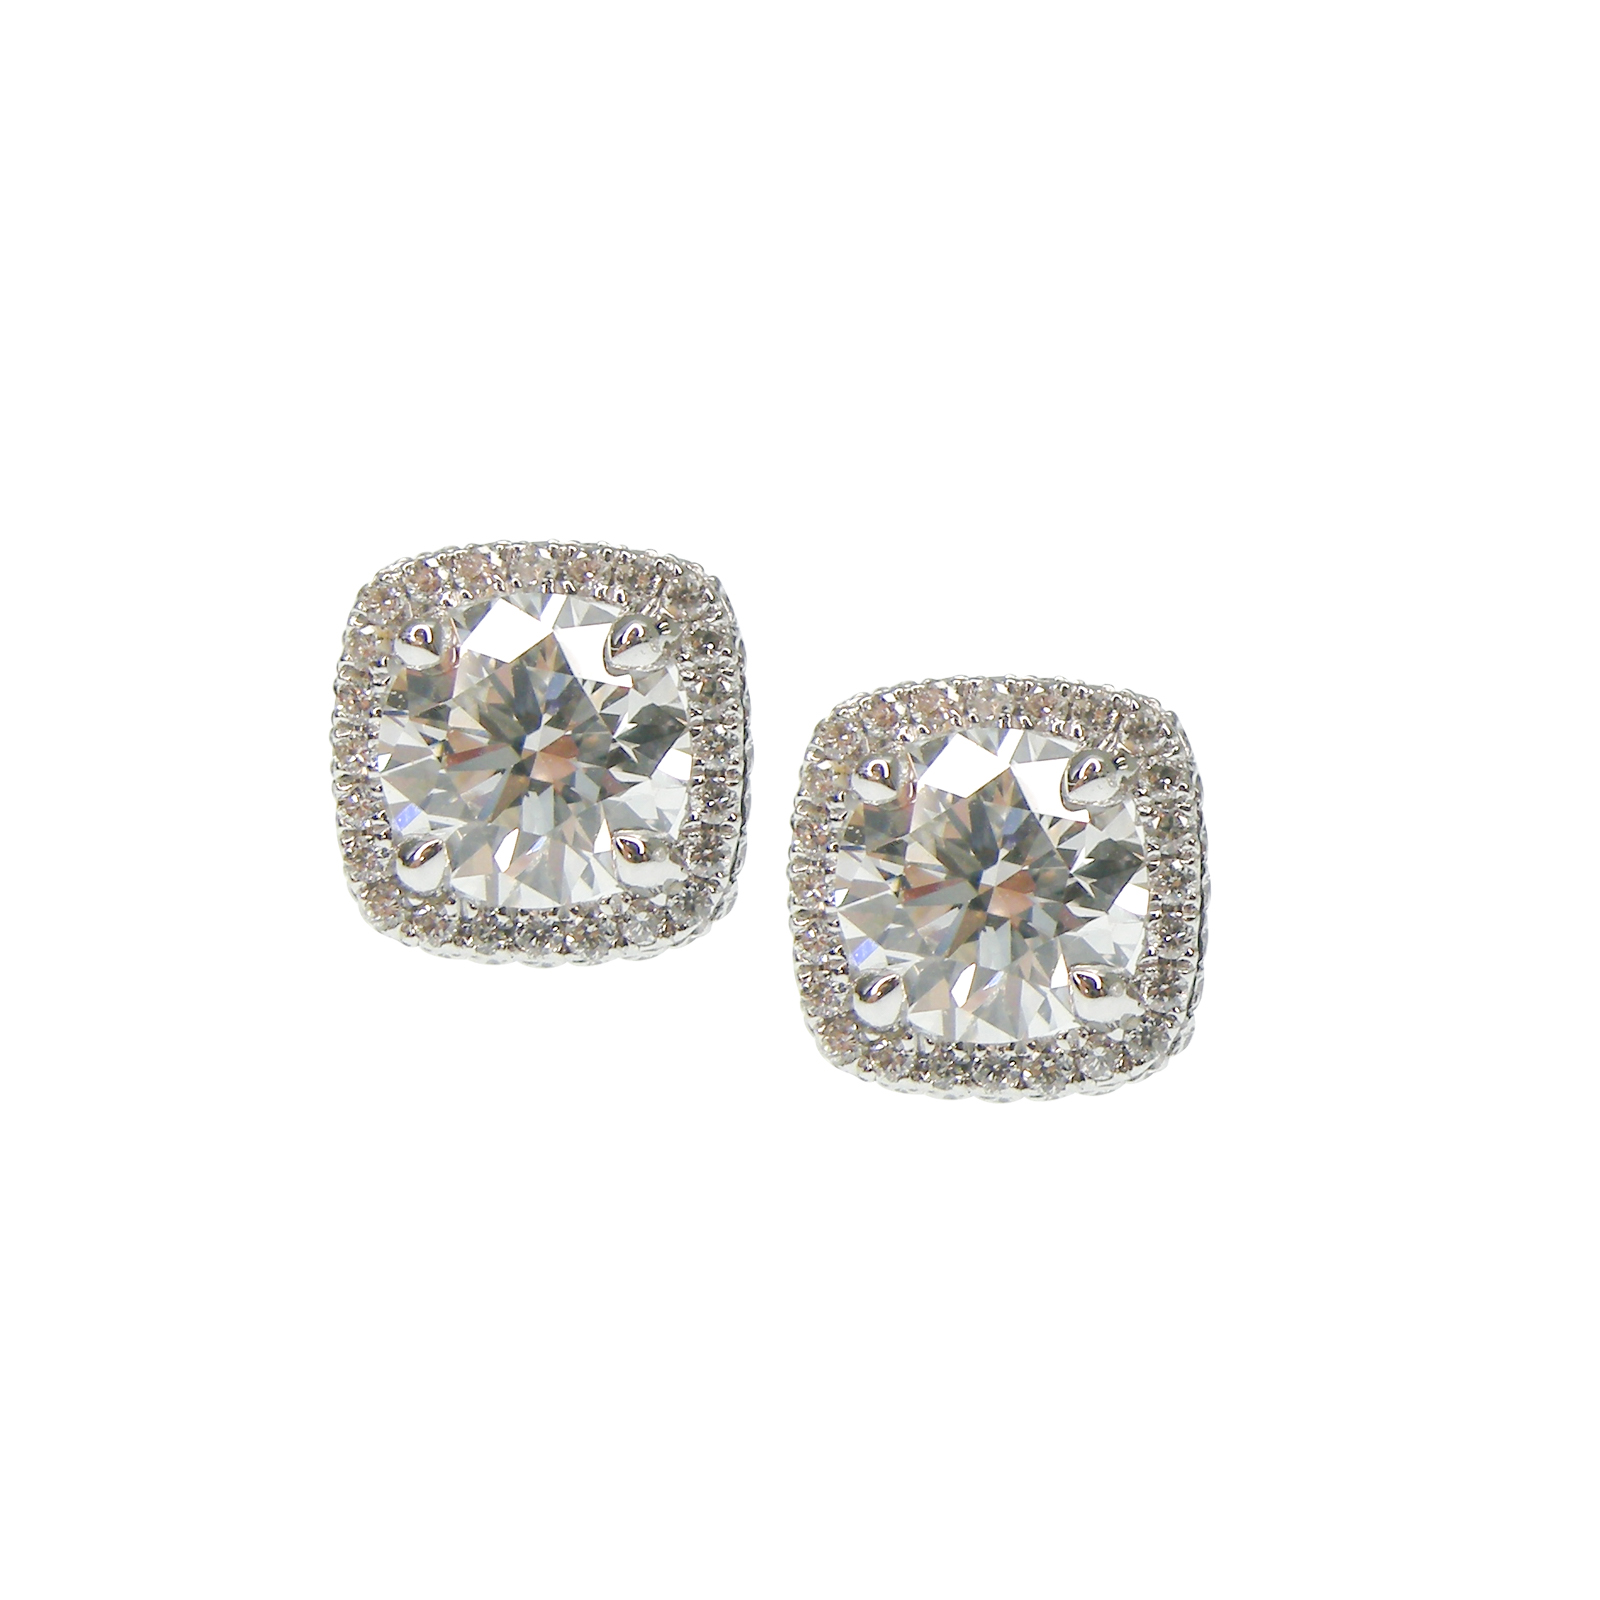 CUSHION HALO DIAMOND STUDS